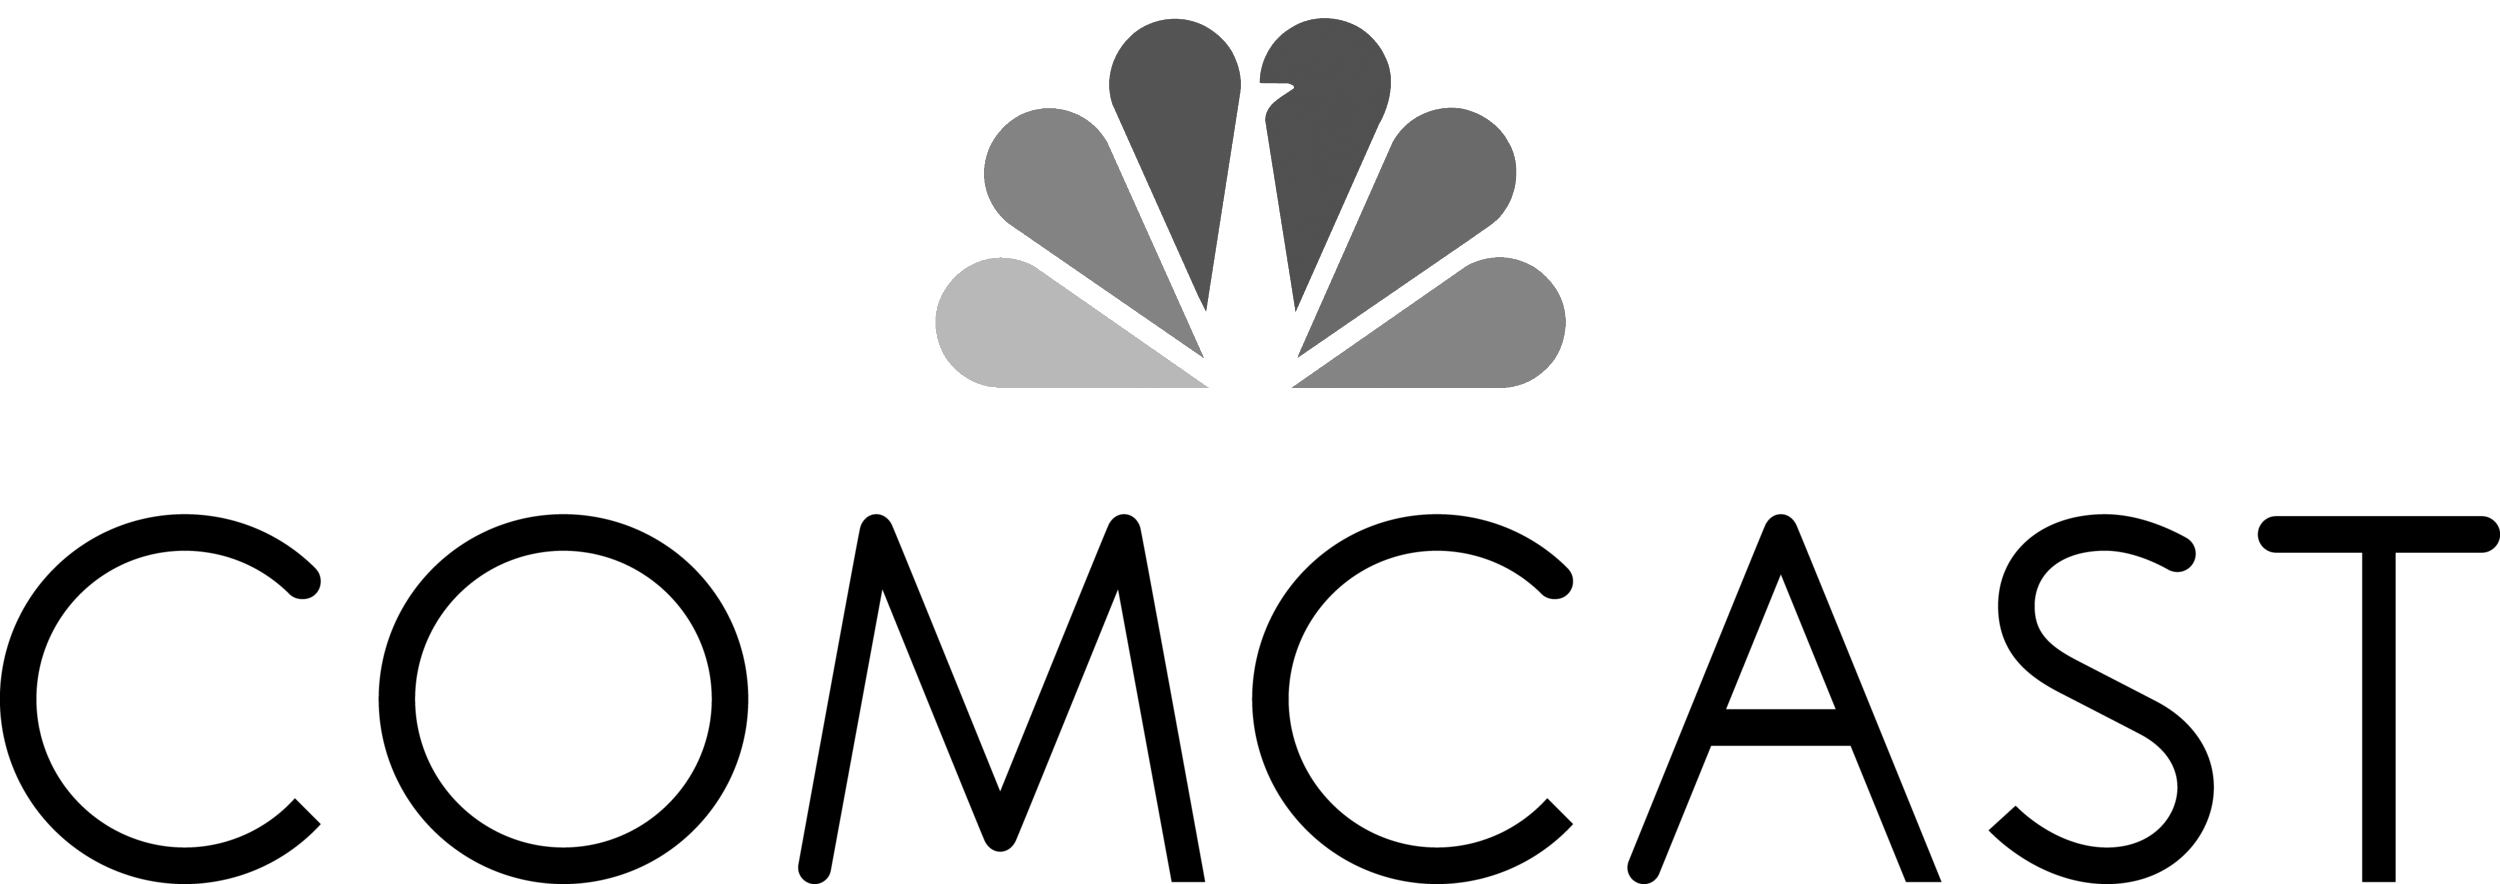 Comcast_logo_2012_grey.png